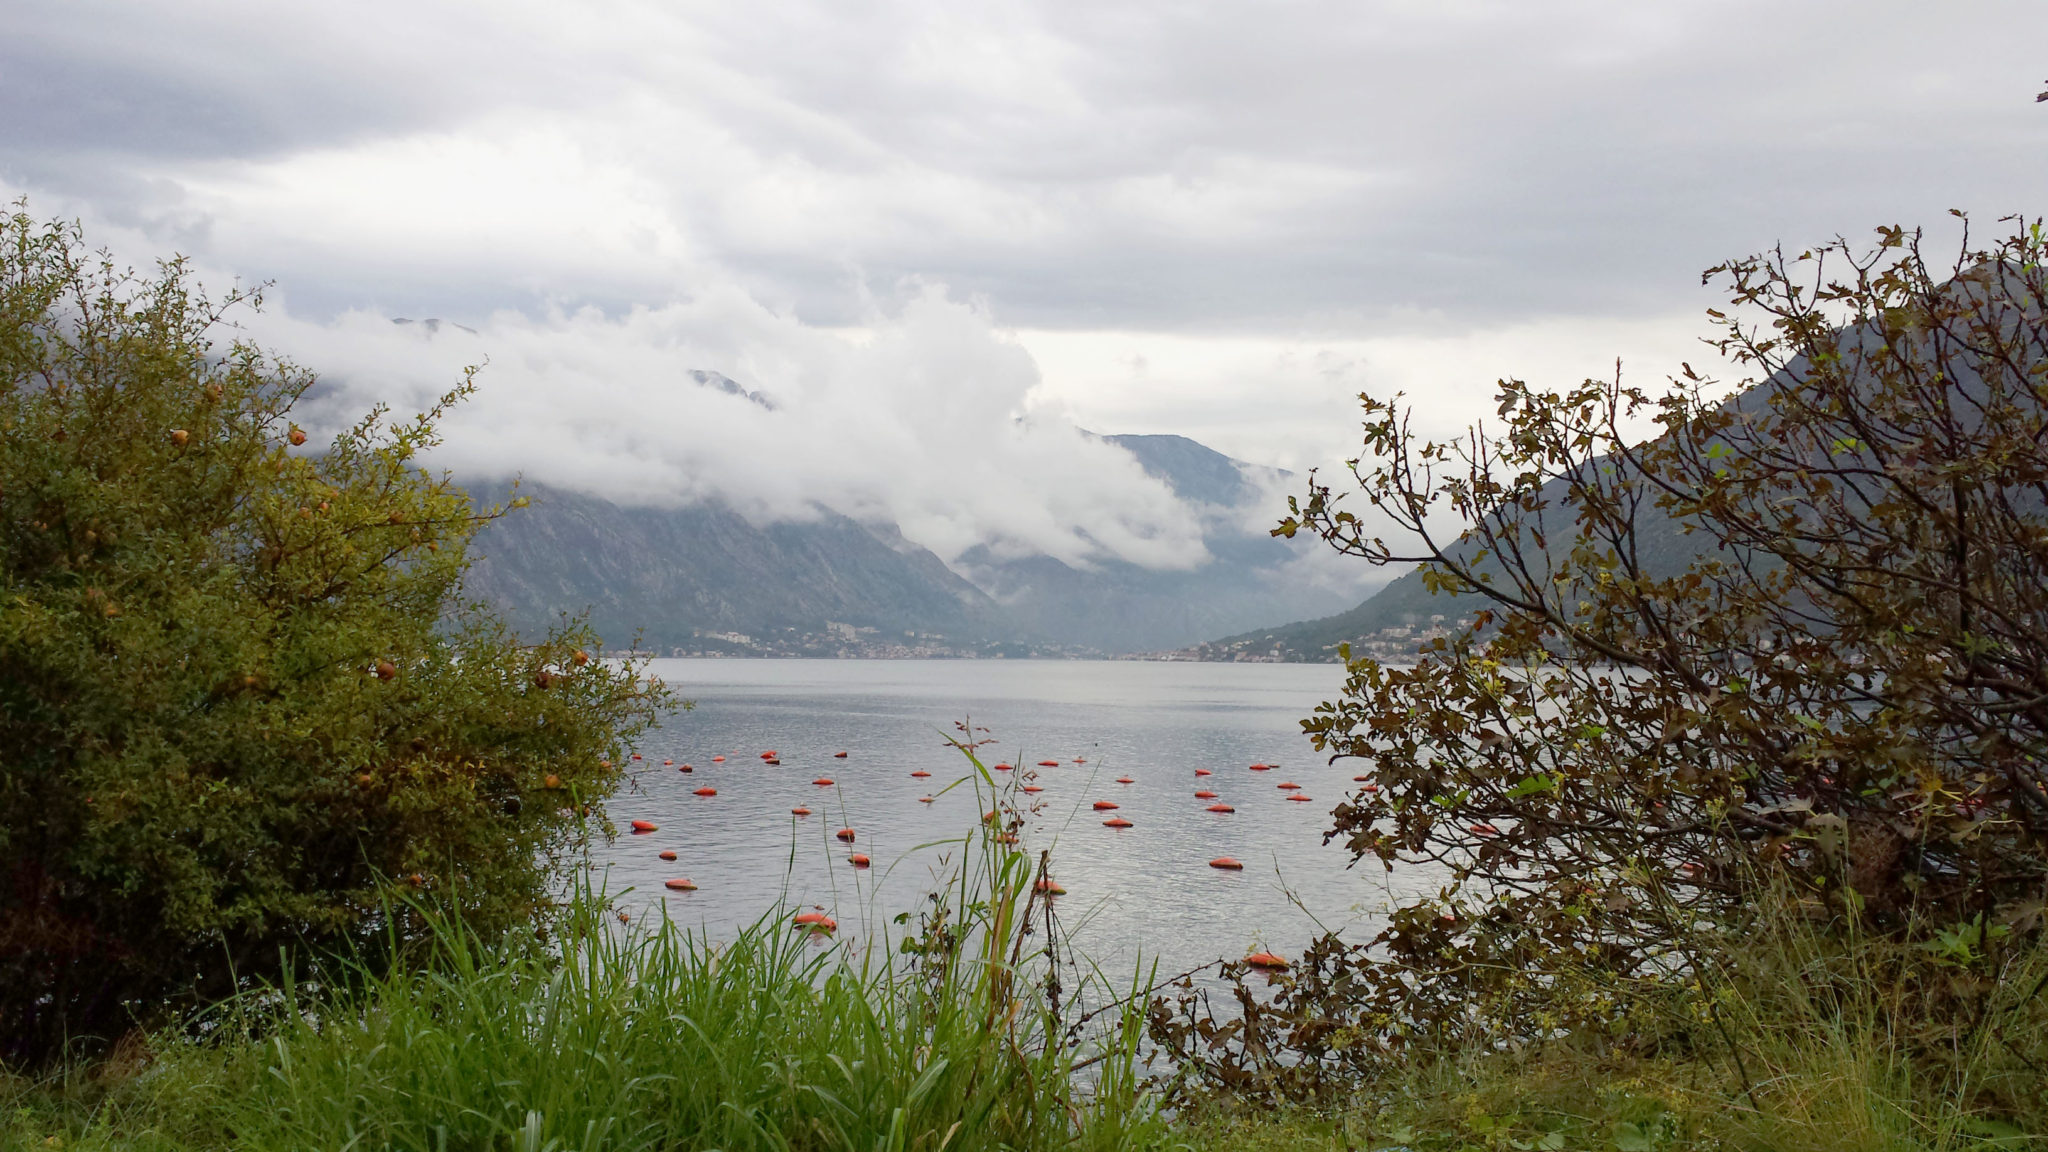 Hema_Montenegro_Perast_kotor bay